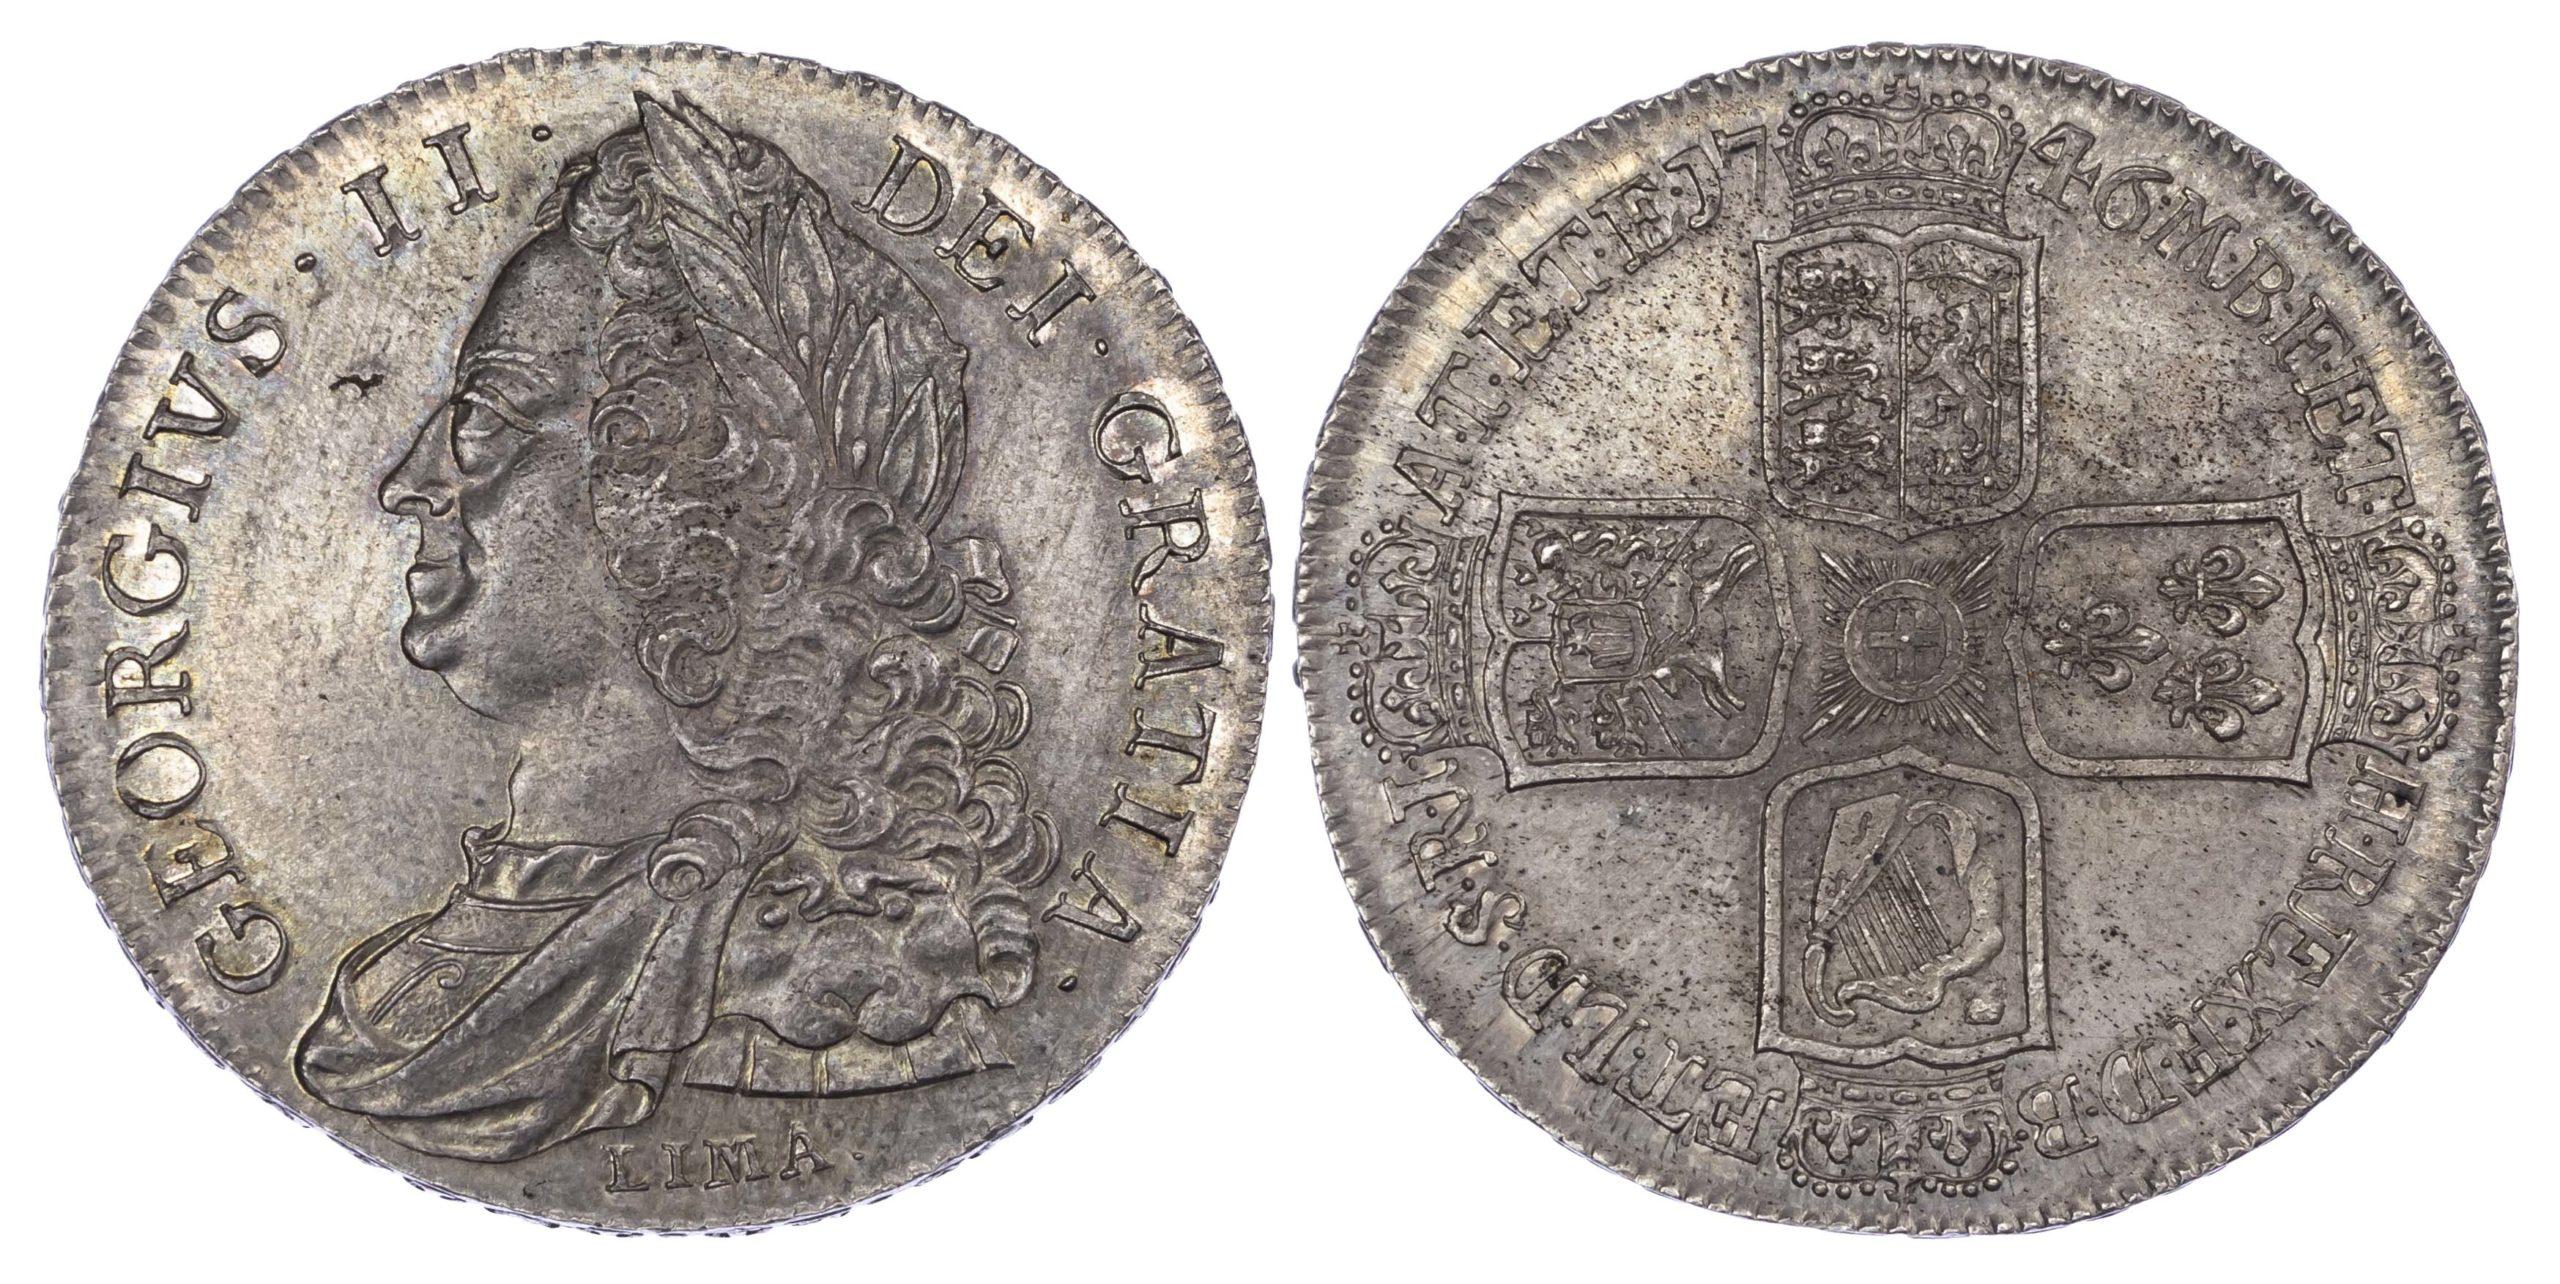 George II (1727-60), Crown, 1746, 'Lima' type